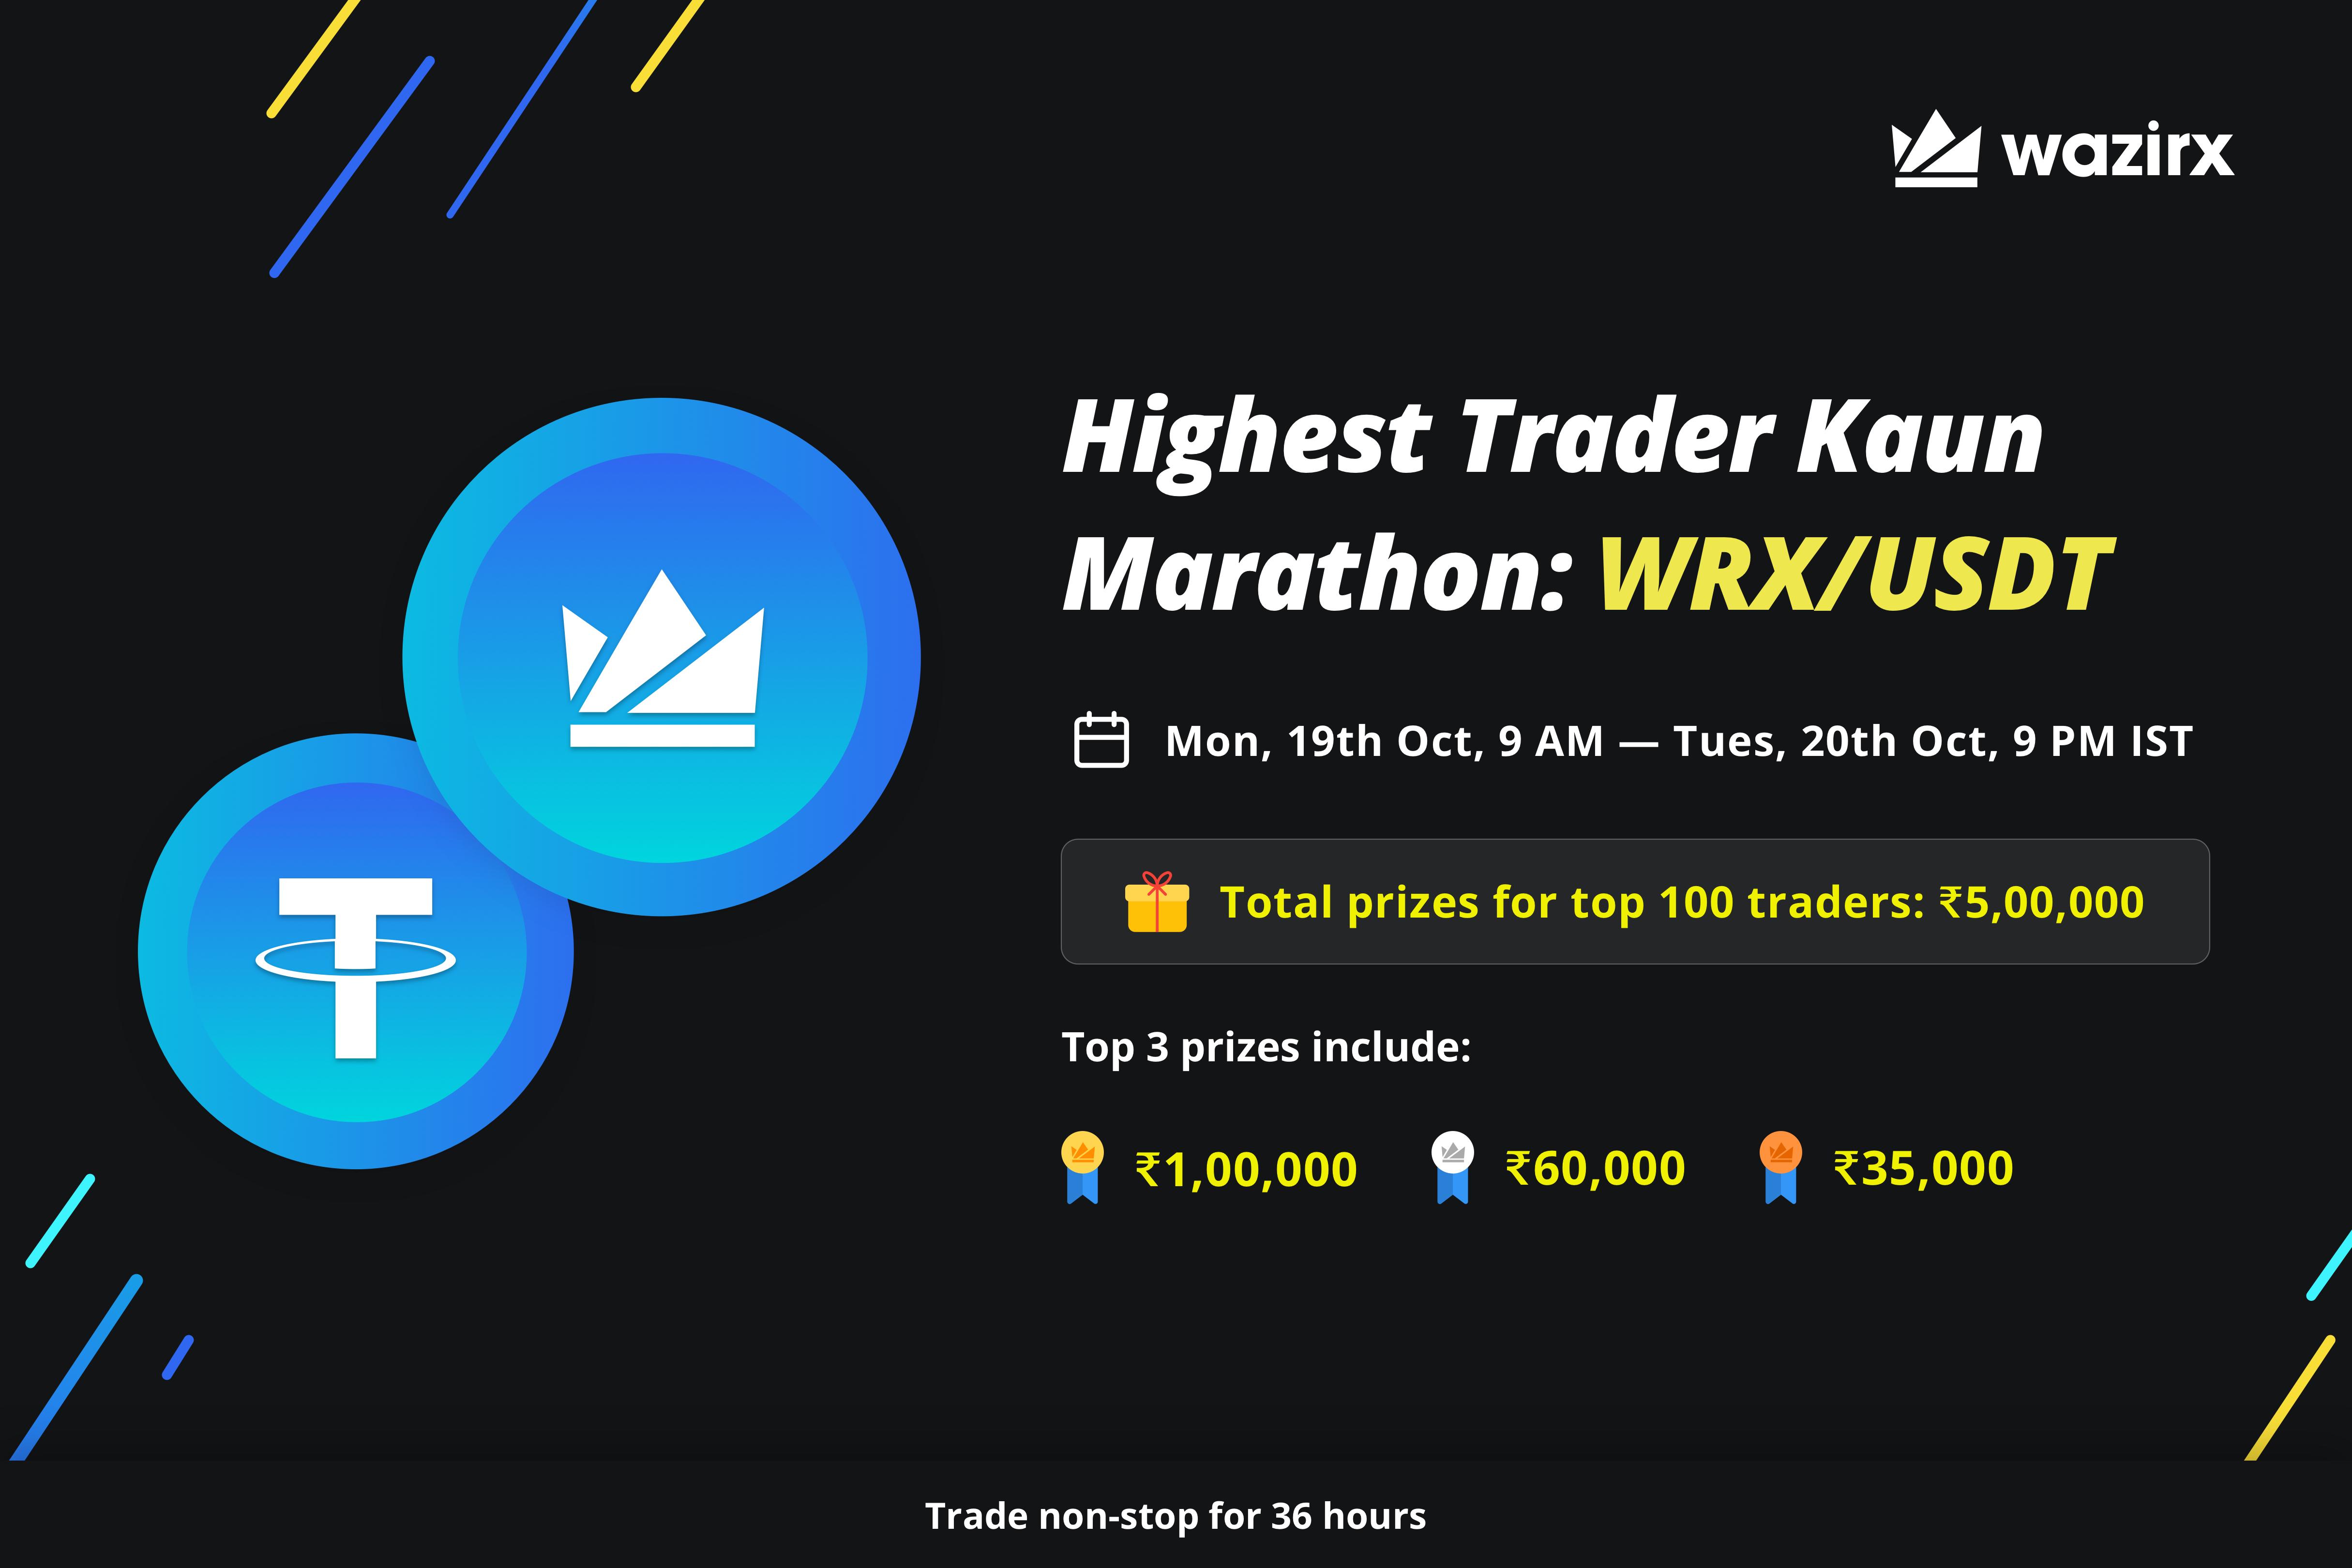 Highest Trader Kaun Marathon: WRX/USDT